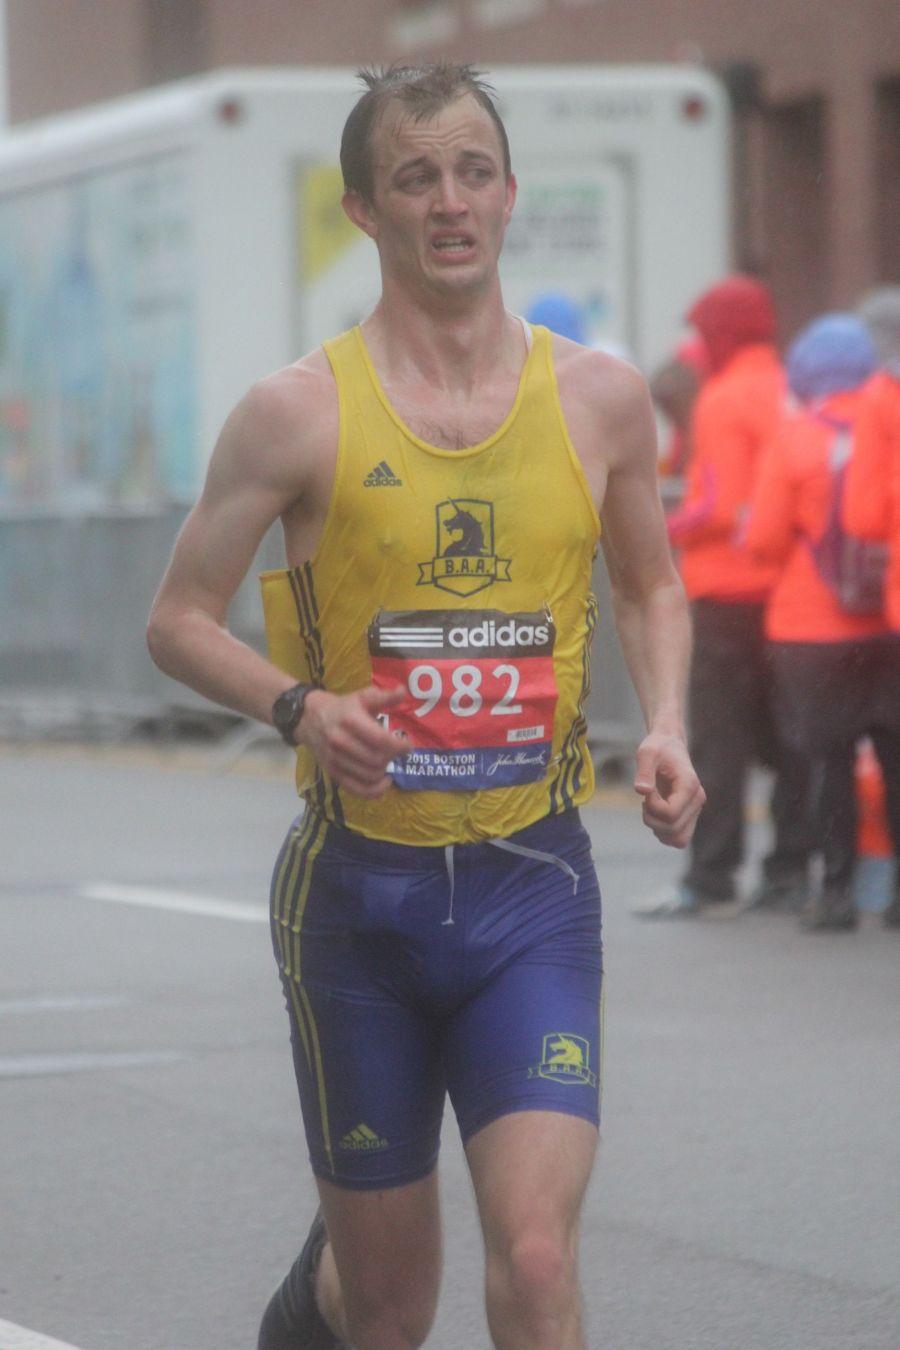 boston marathon april 20 2015 racer number 982